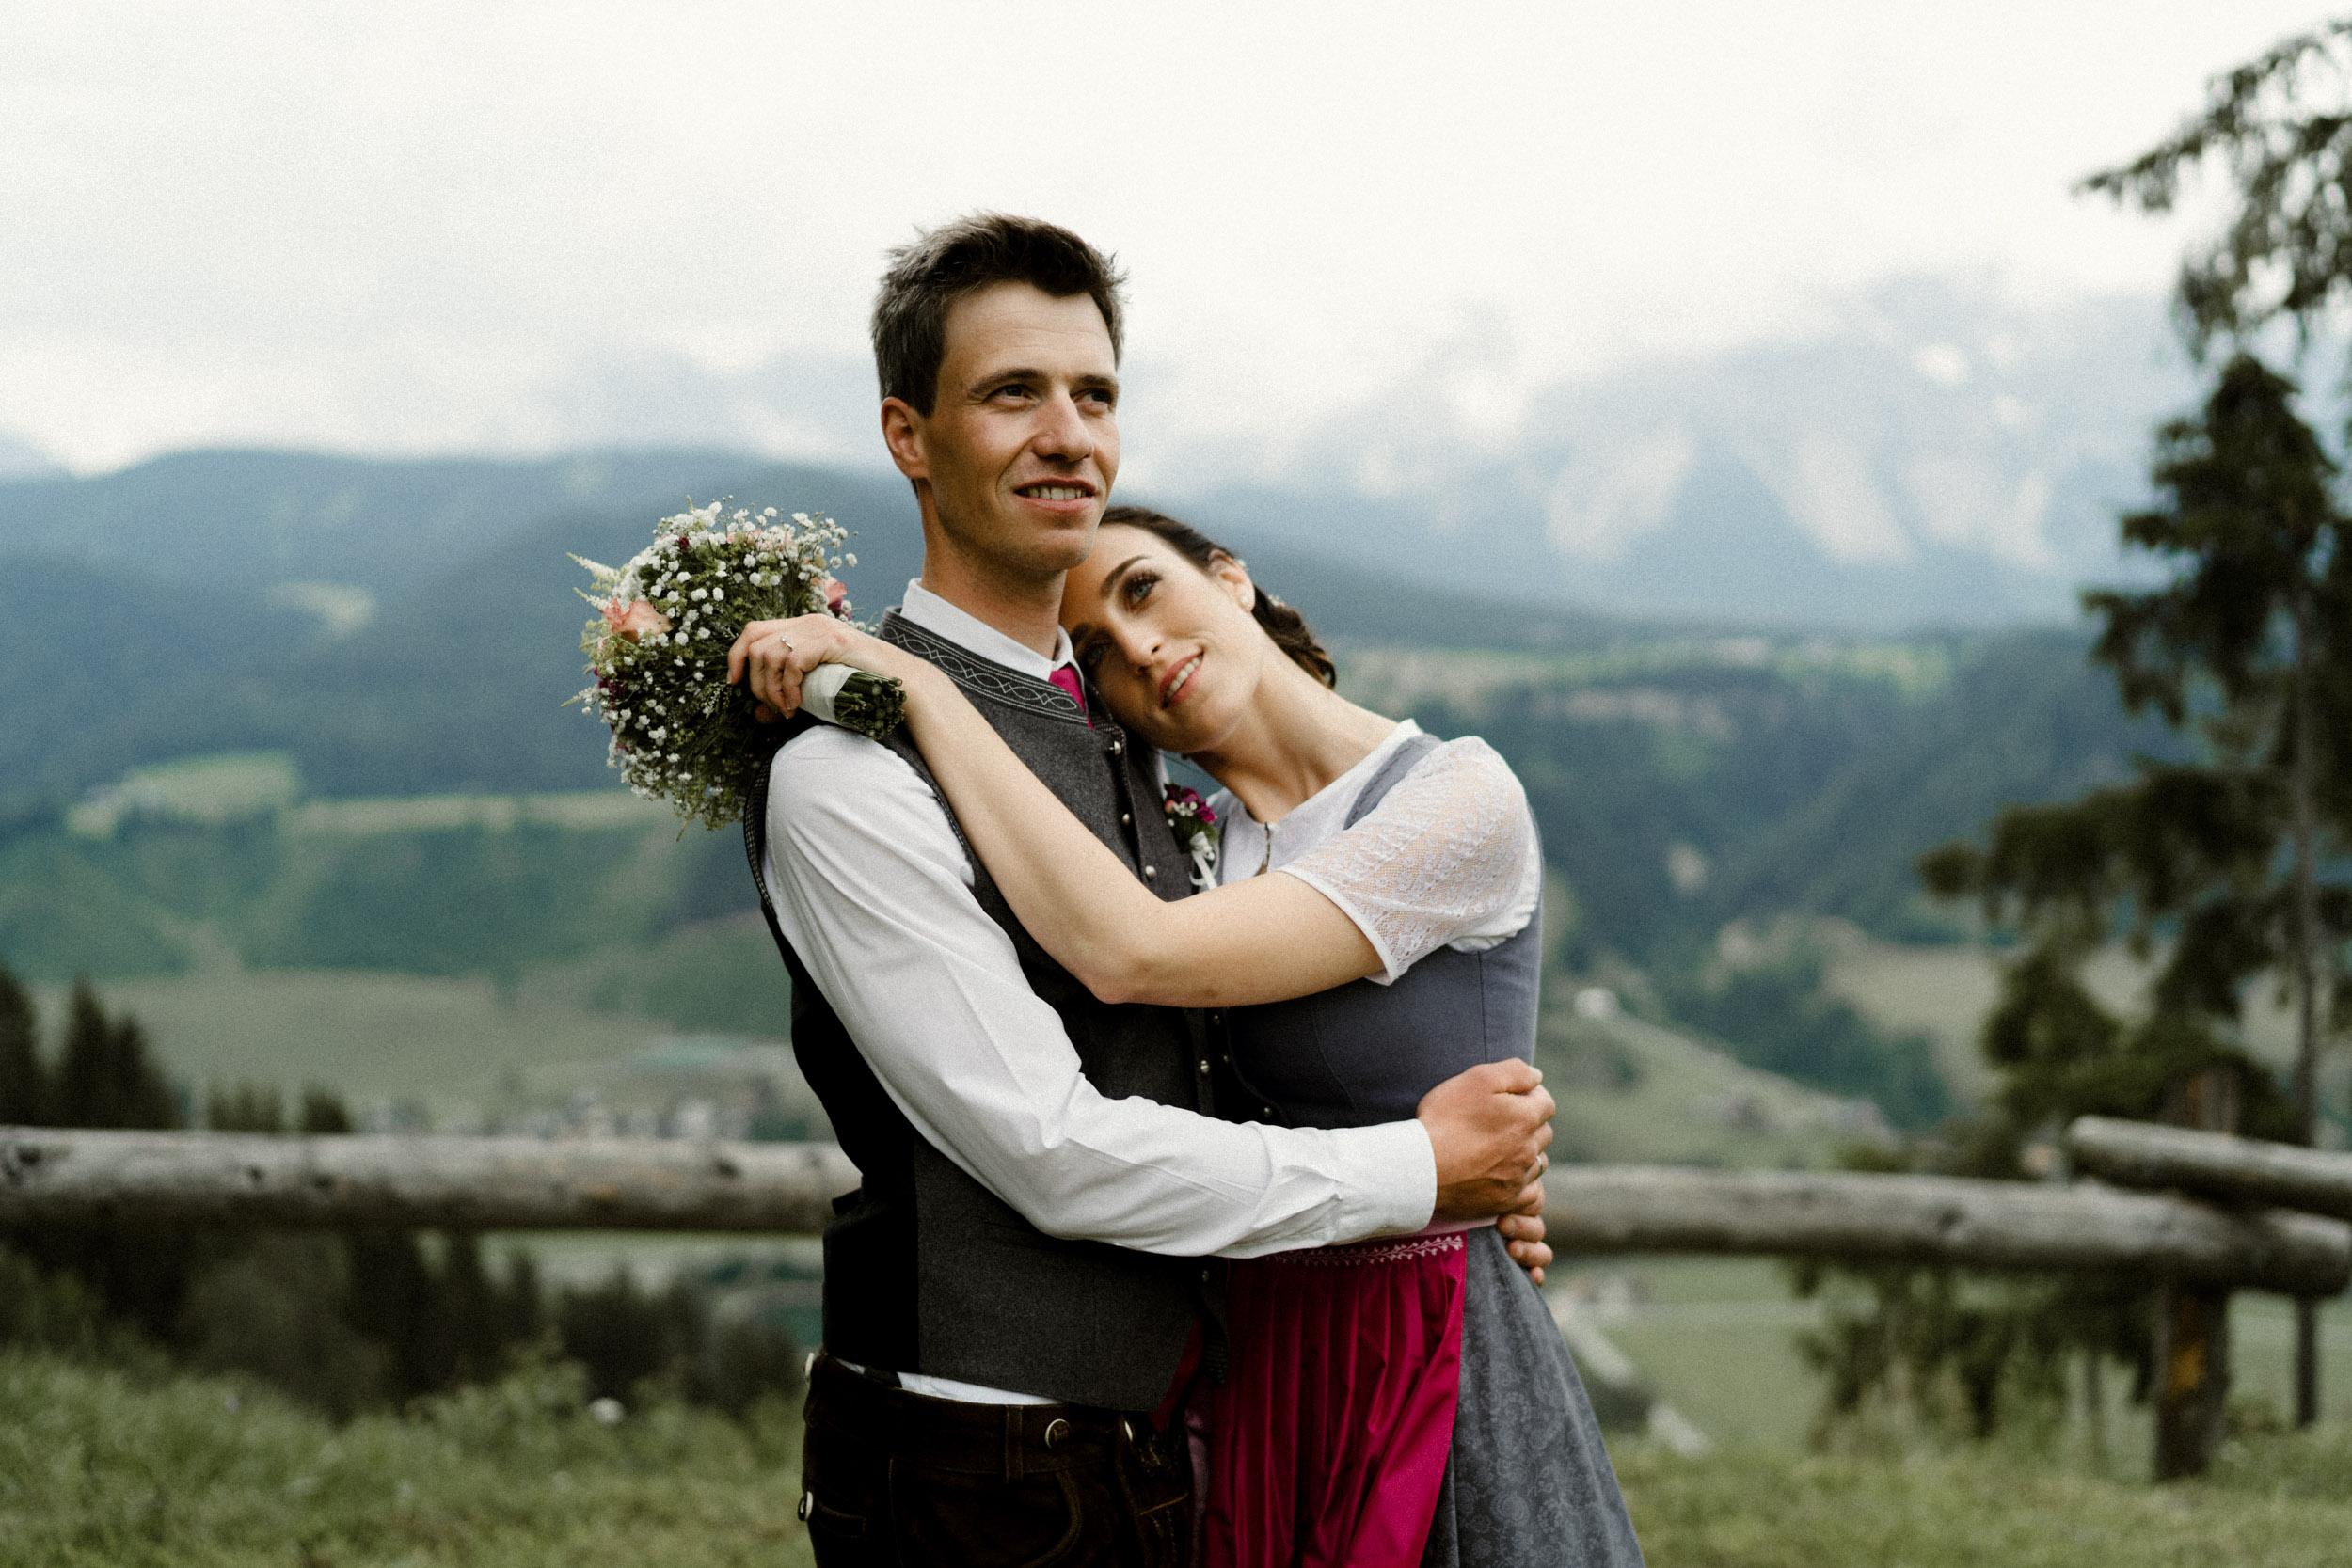 austria_mountain_wedding_photography_countryside_vienna-16.jpg